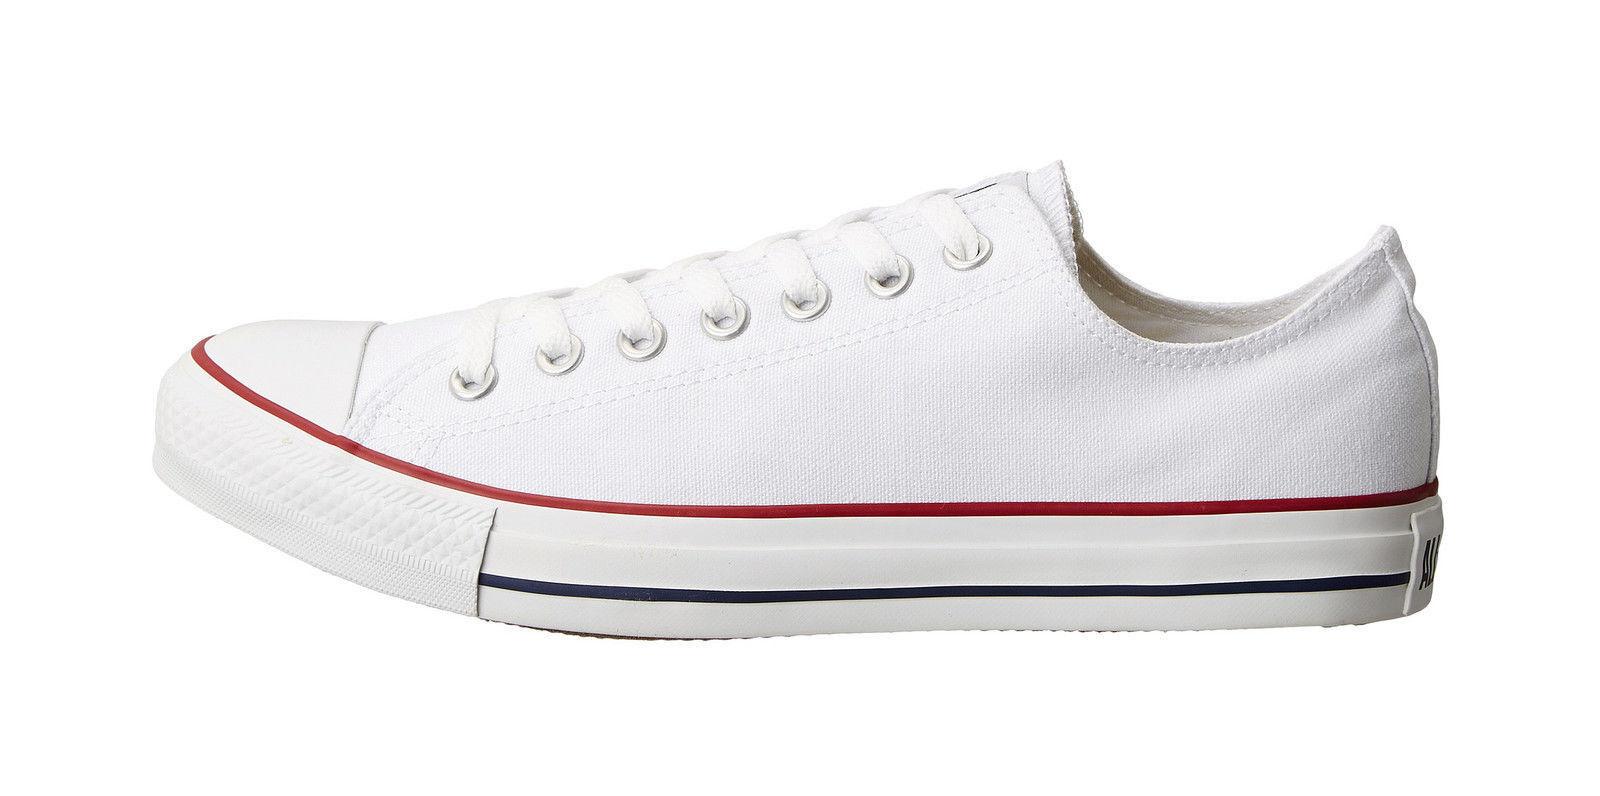 Converse Women Shoes Classic Chuck Taylor Low Top Optical White Fashion CTAL